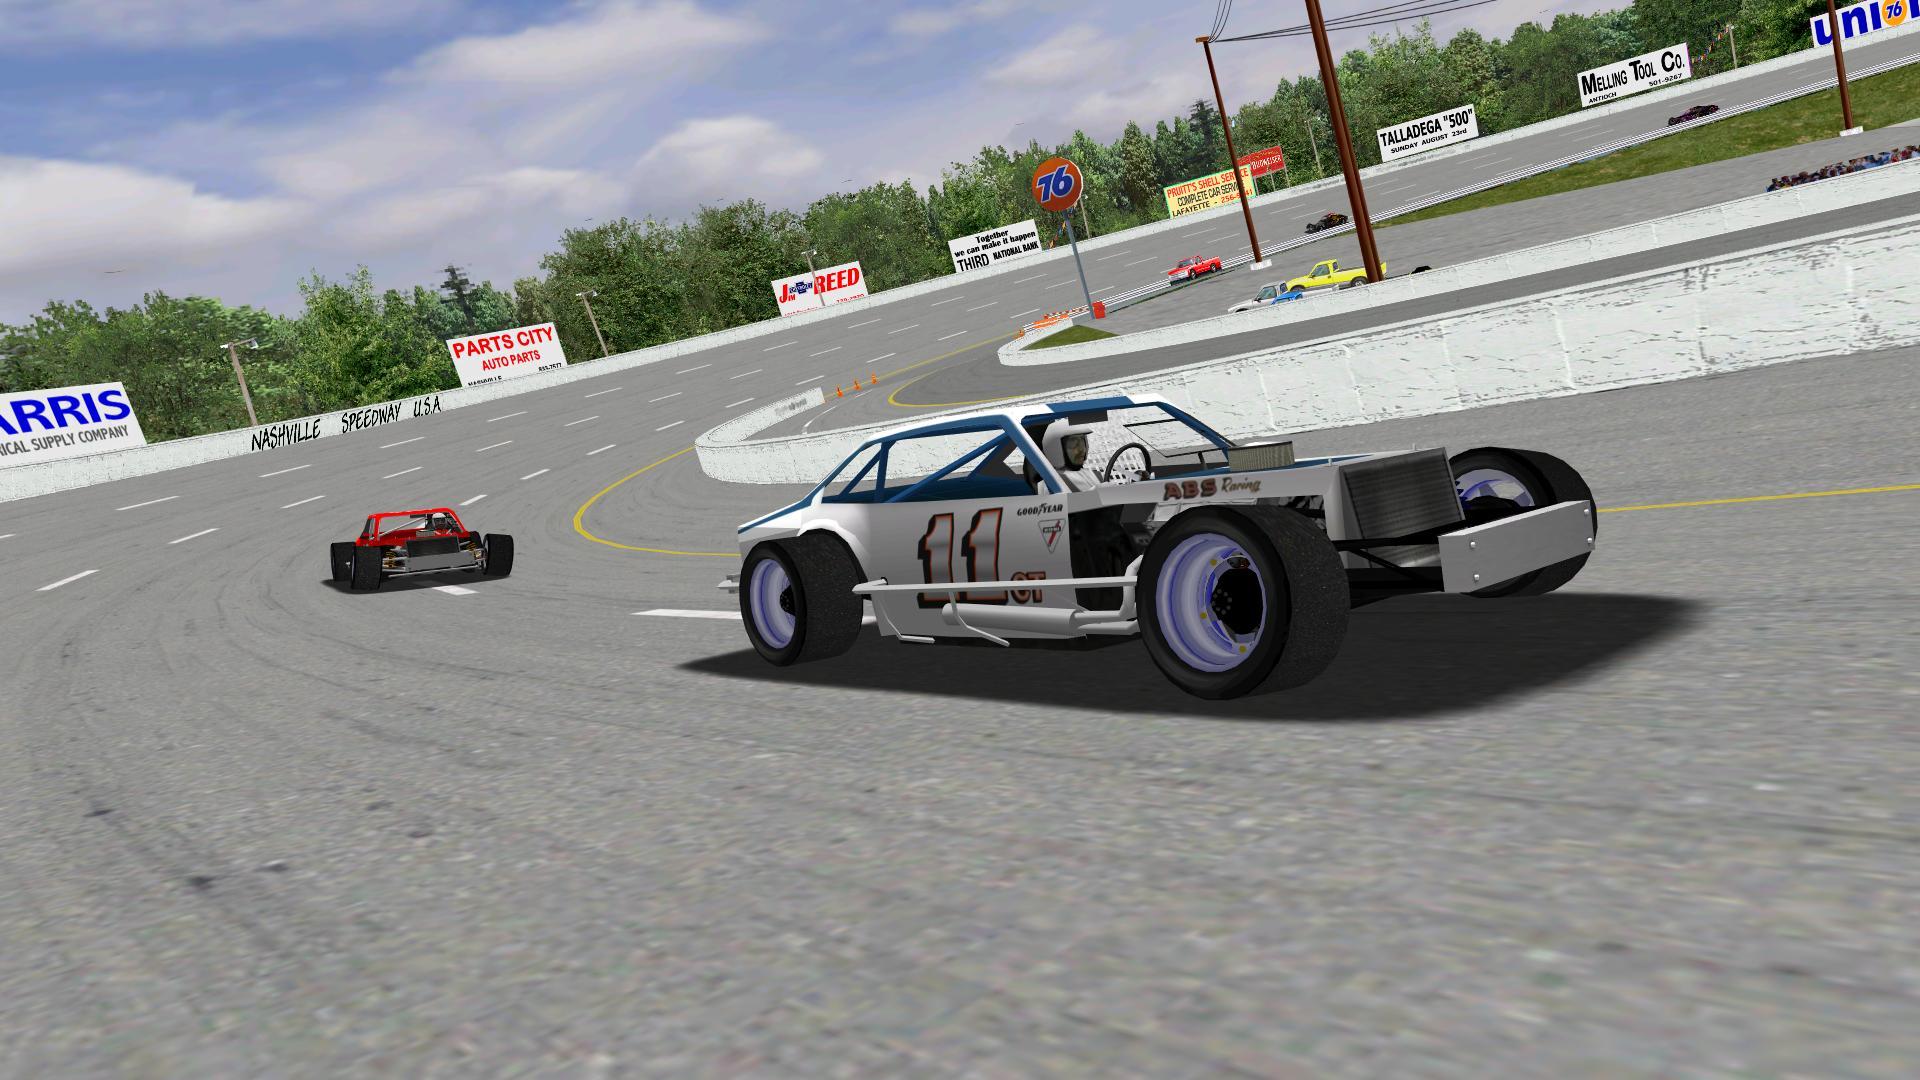 Speedyman11 leading KartRacer63 through turn four at Nashville. (NHMA)